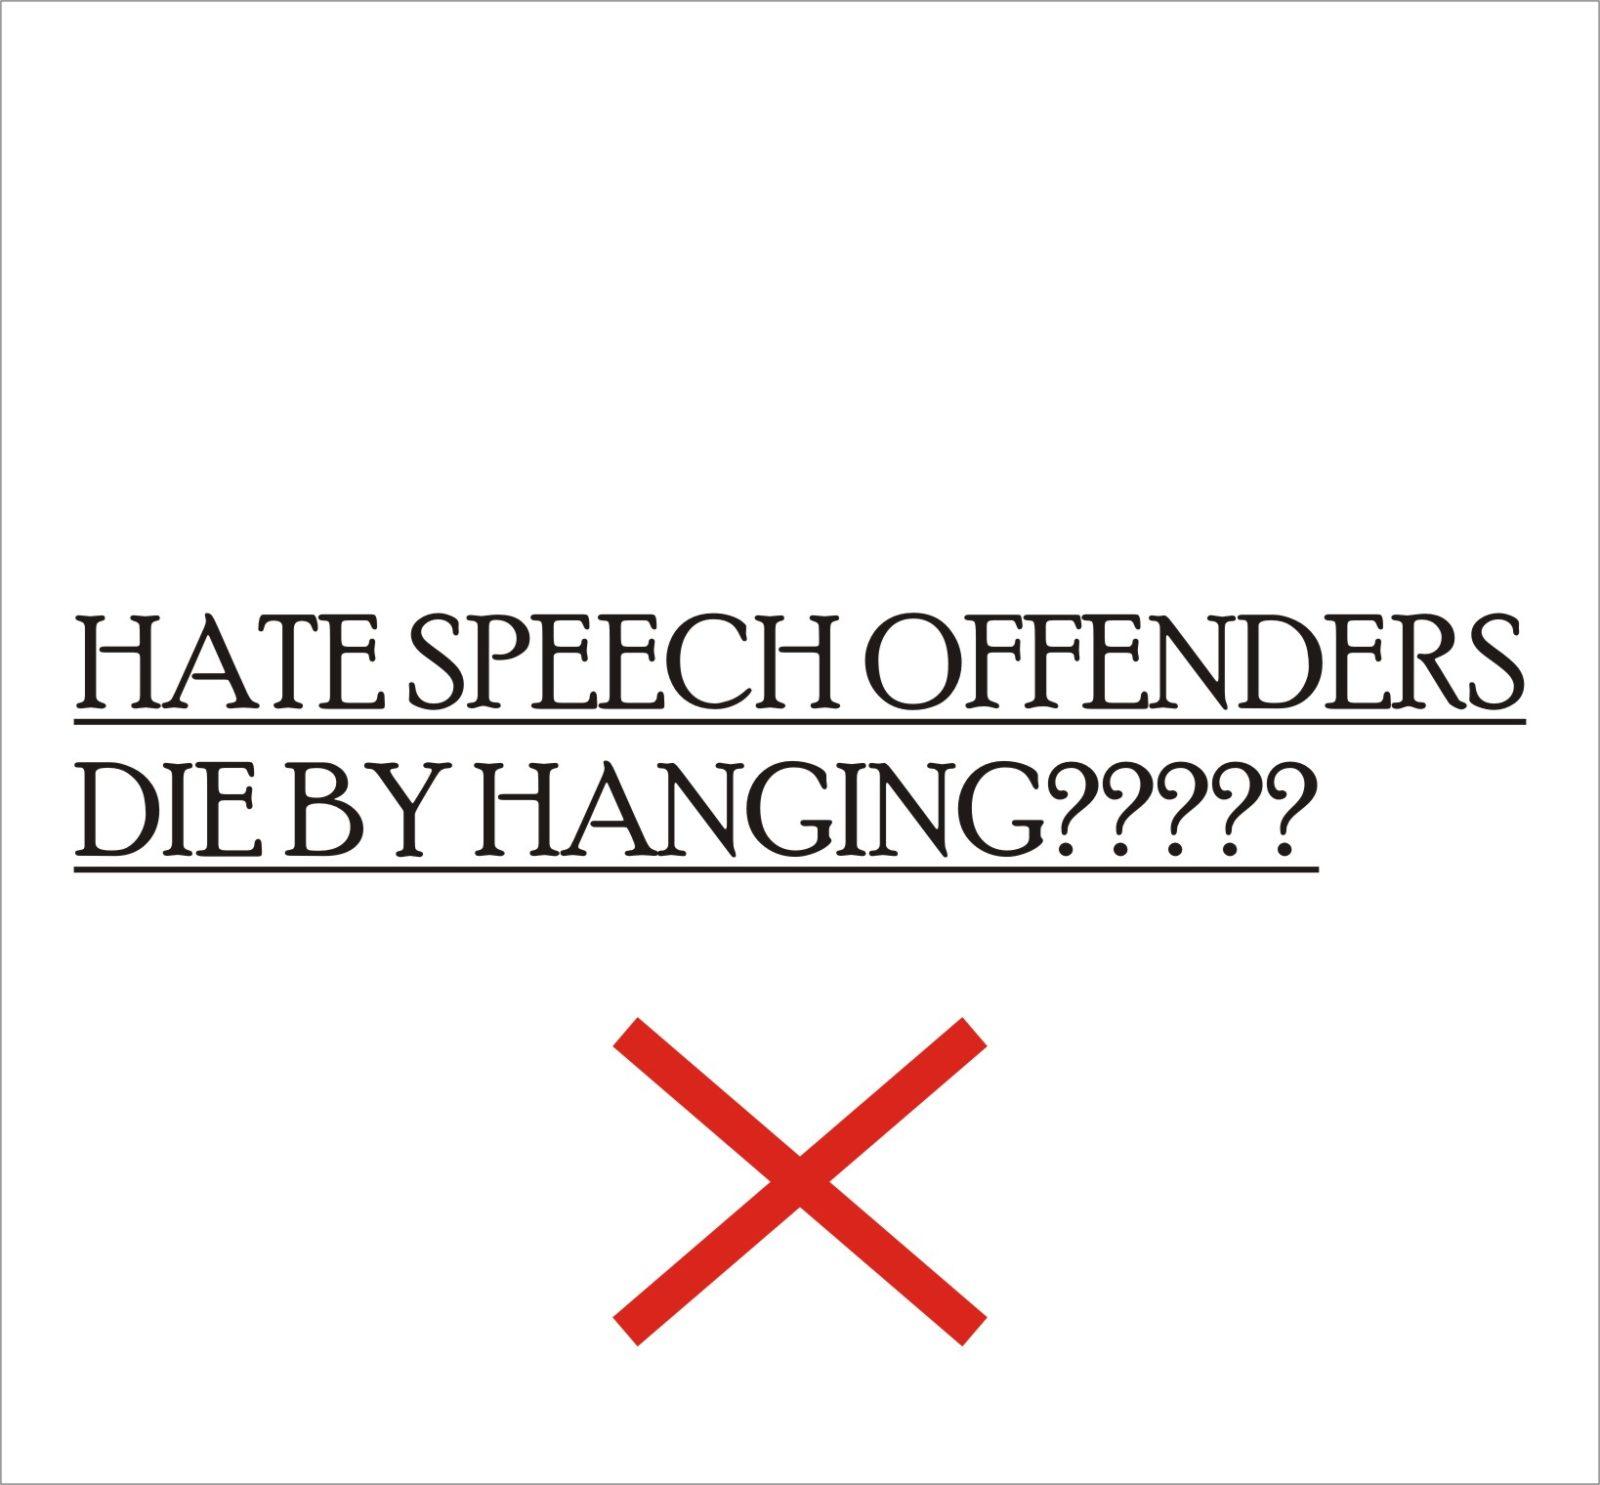 HATE SPEECH- Everyone caught making hate speech will die by hanging- Senate's new bill